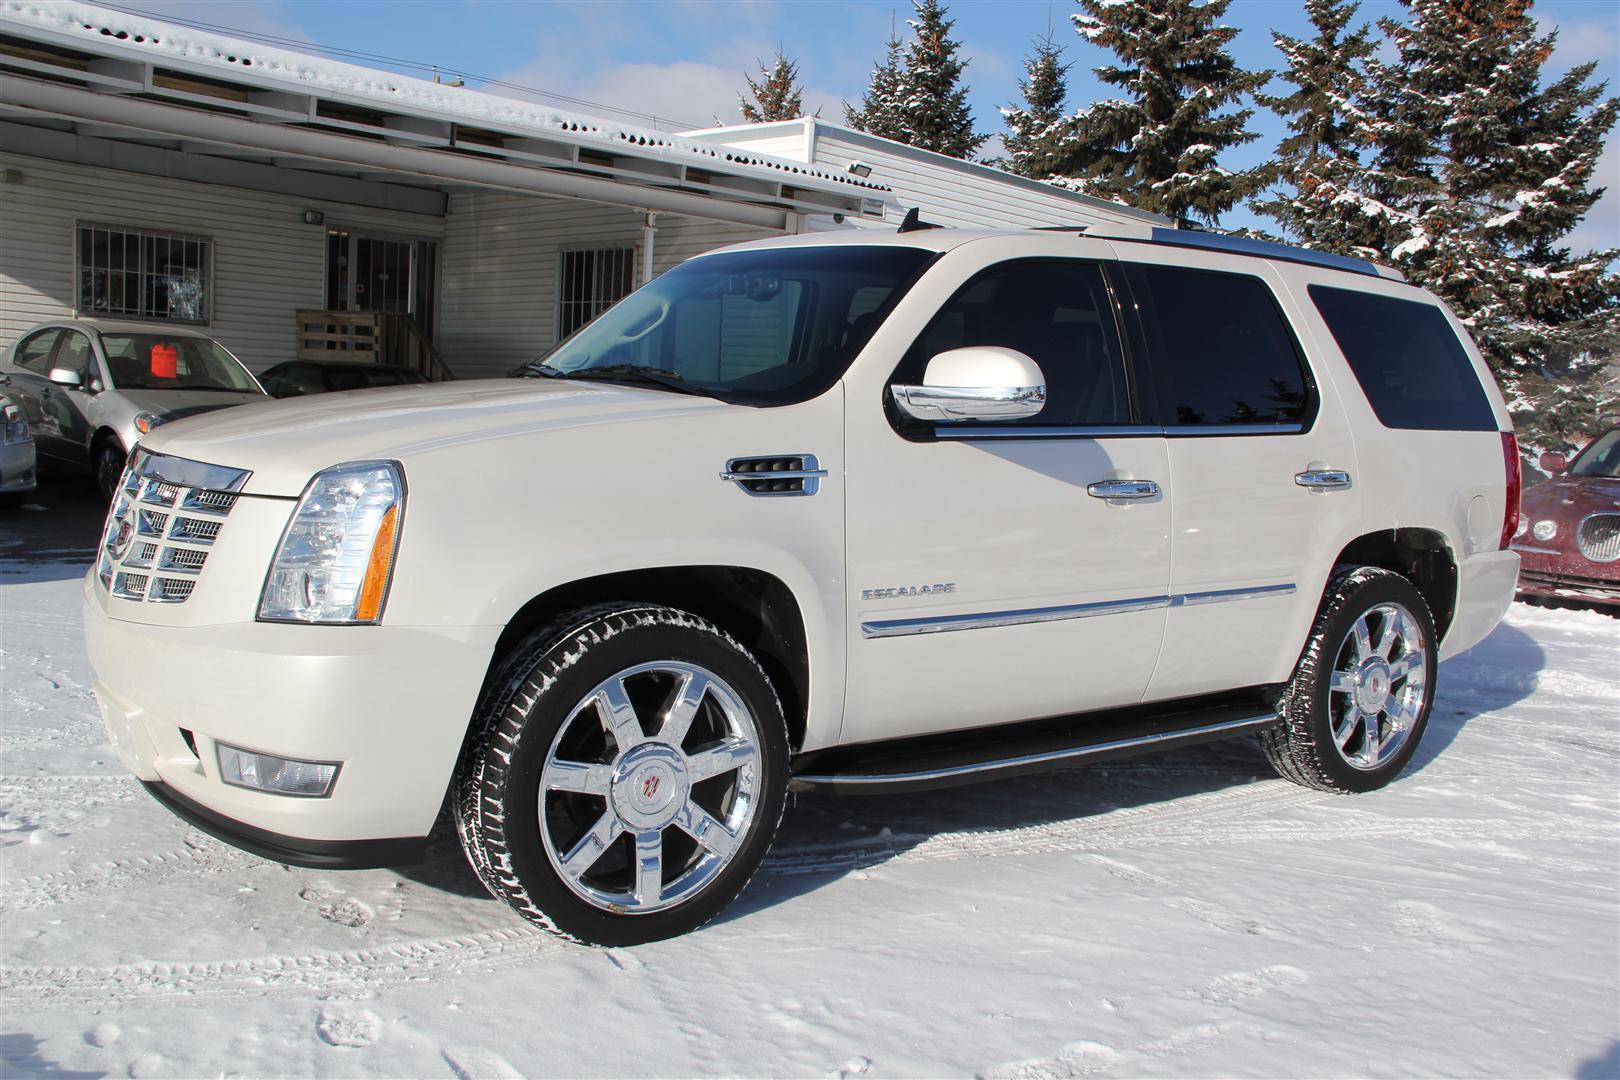 2010 Cadillac Escalade AWD Ultra Luxury - Envision Auto